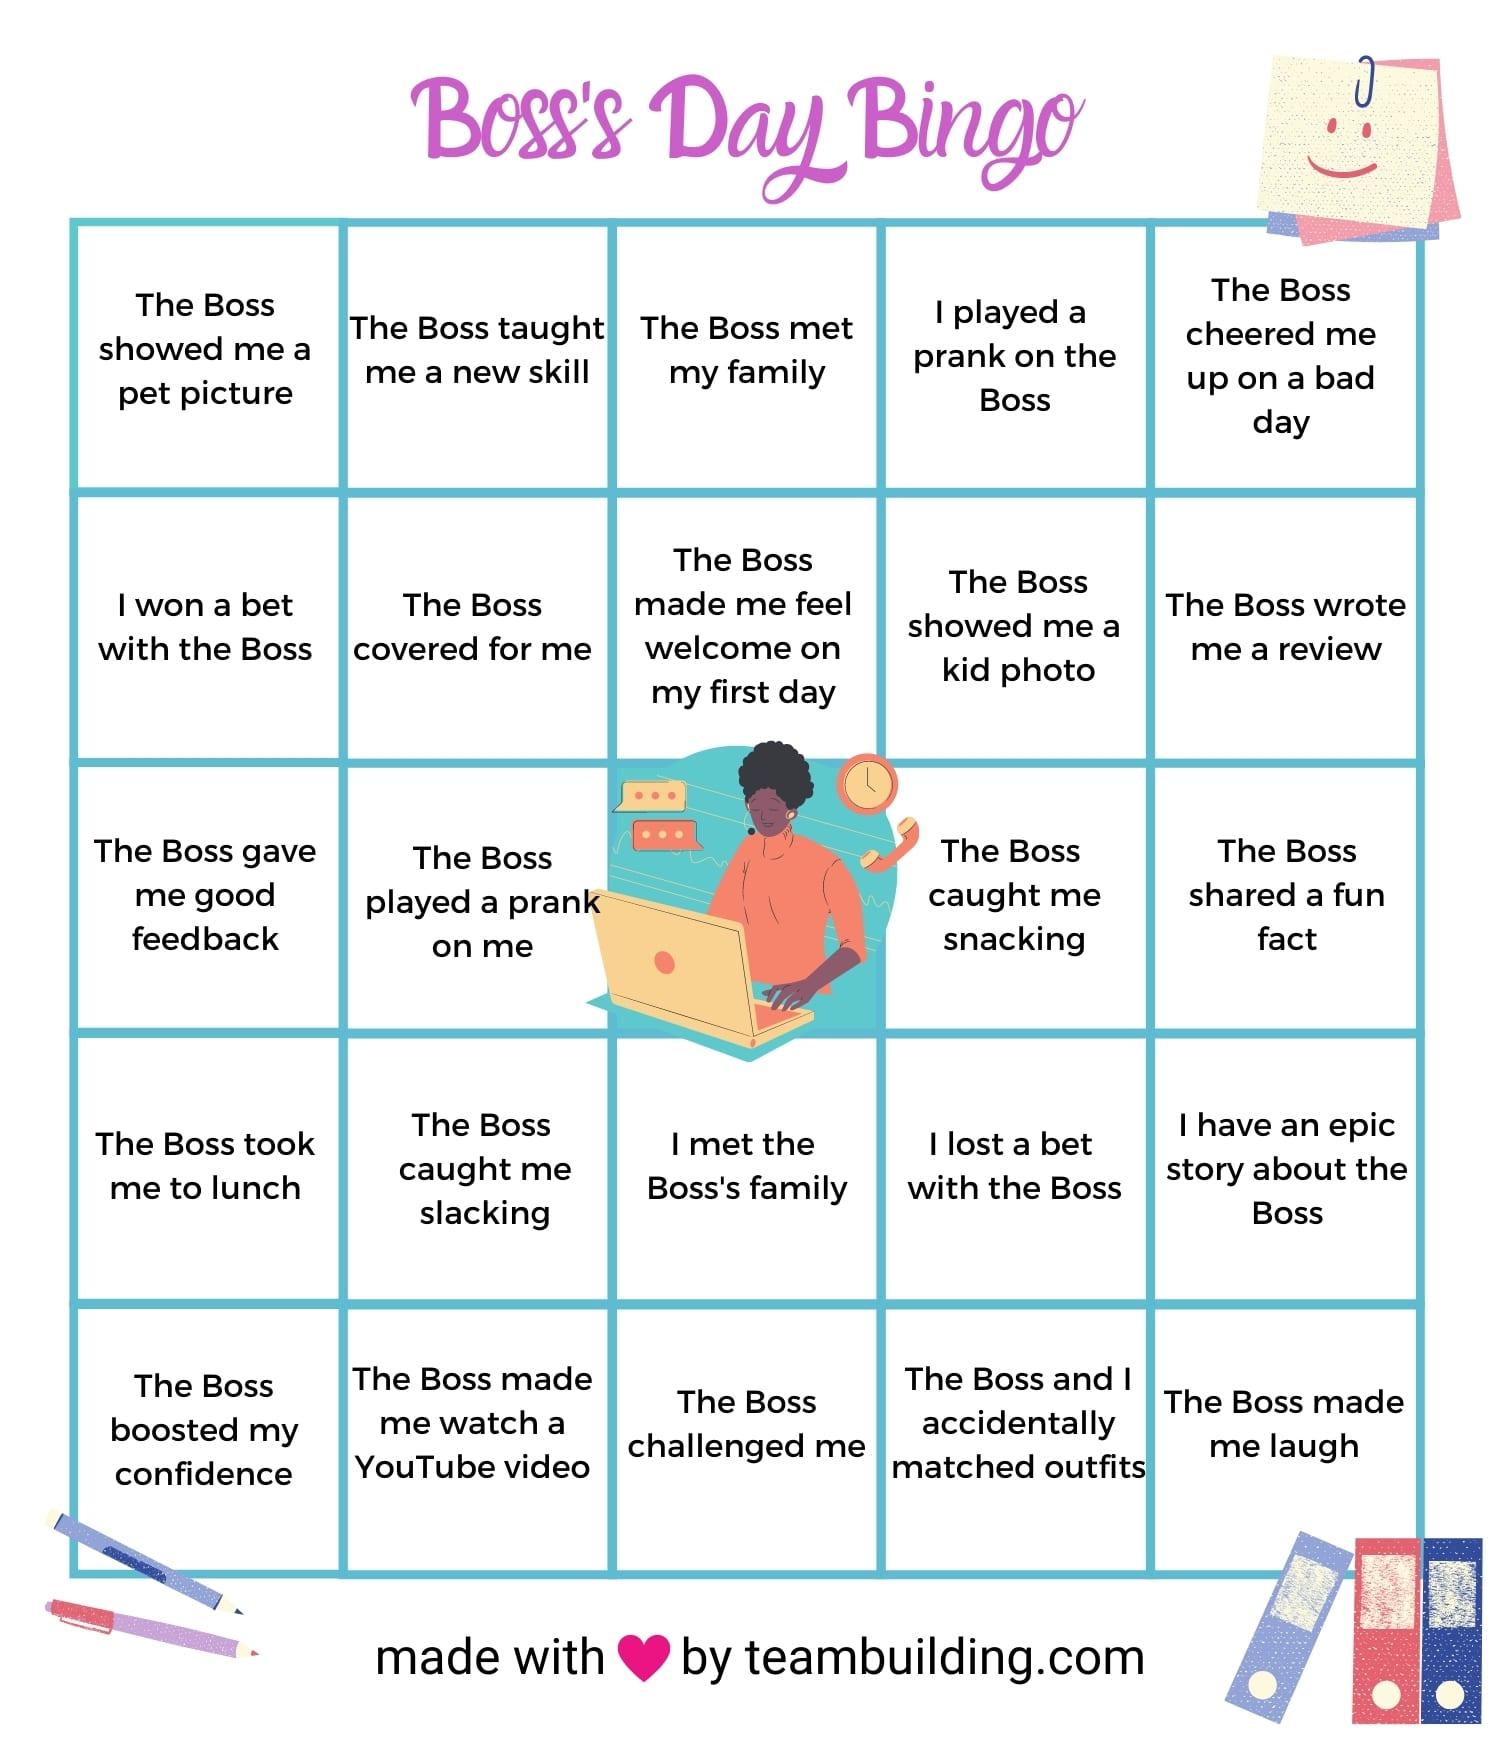 Boss Day Bingo game template